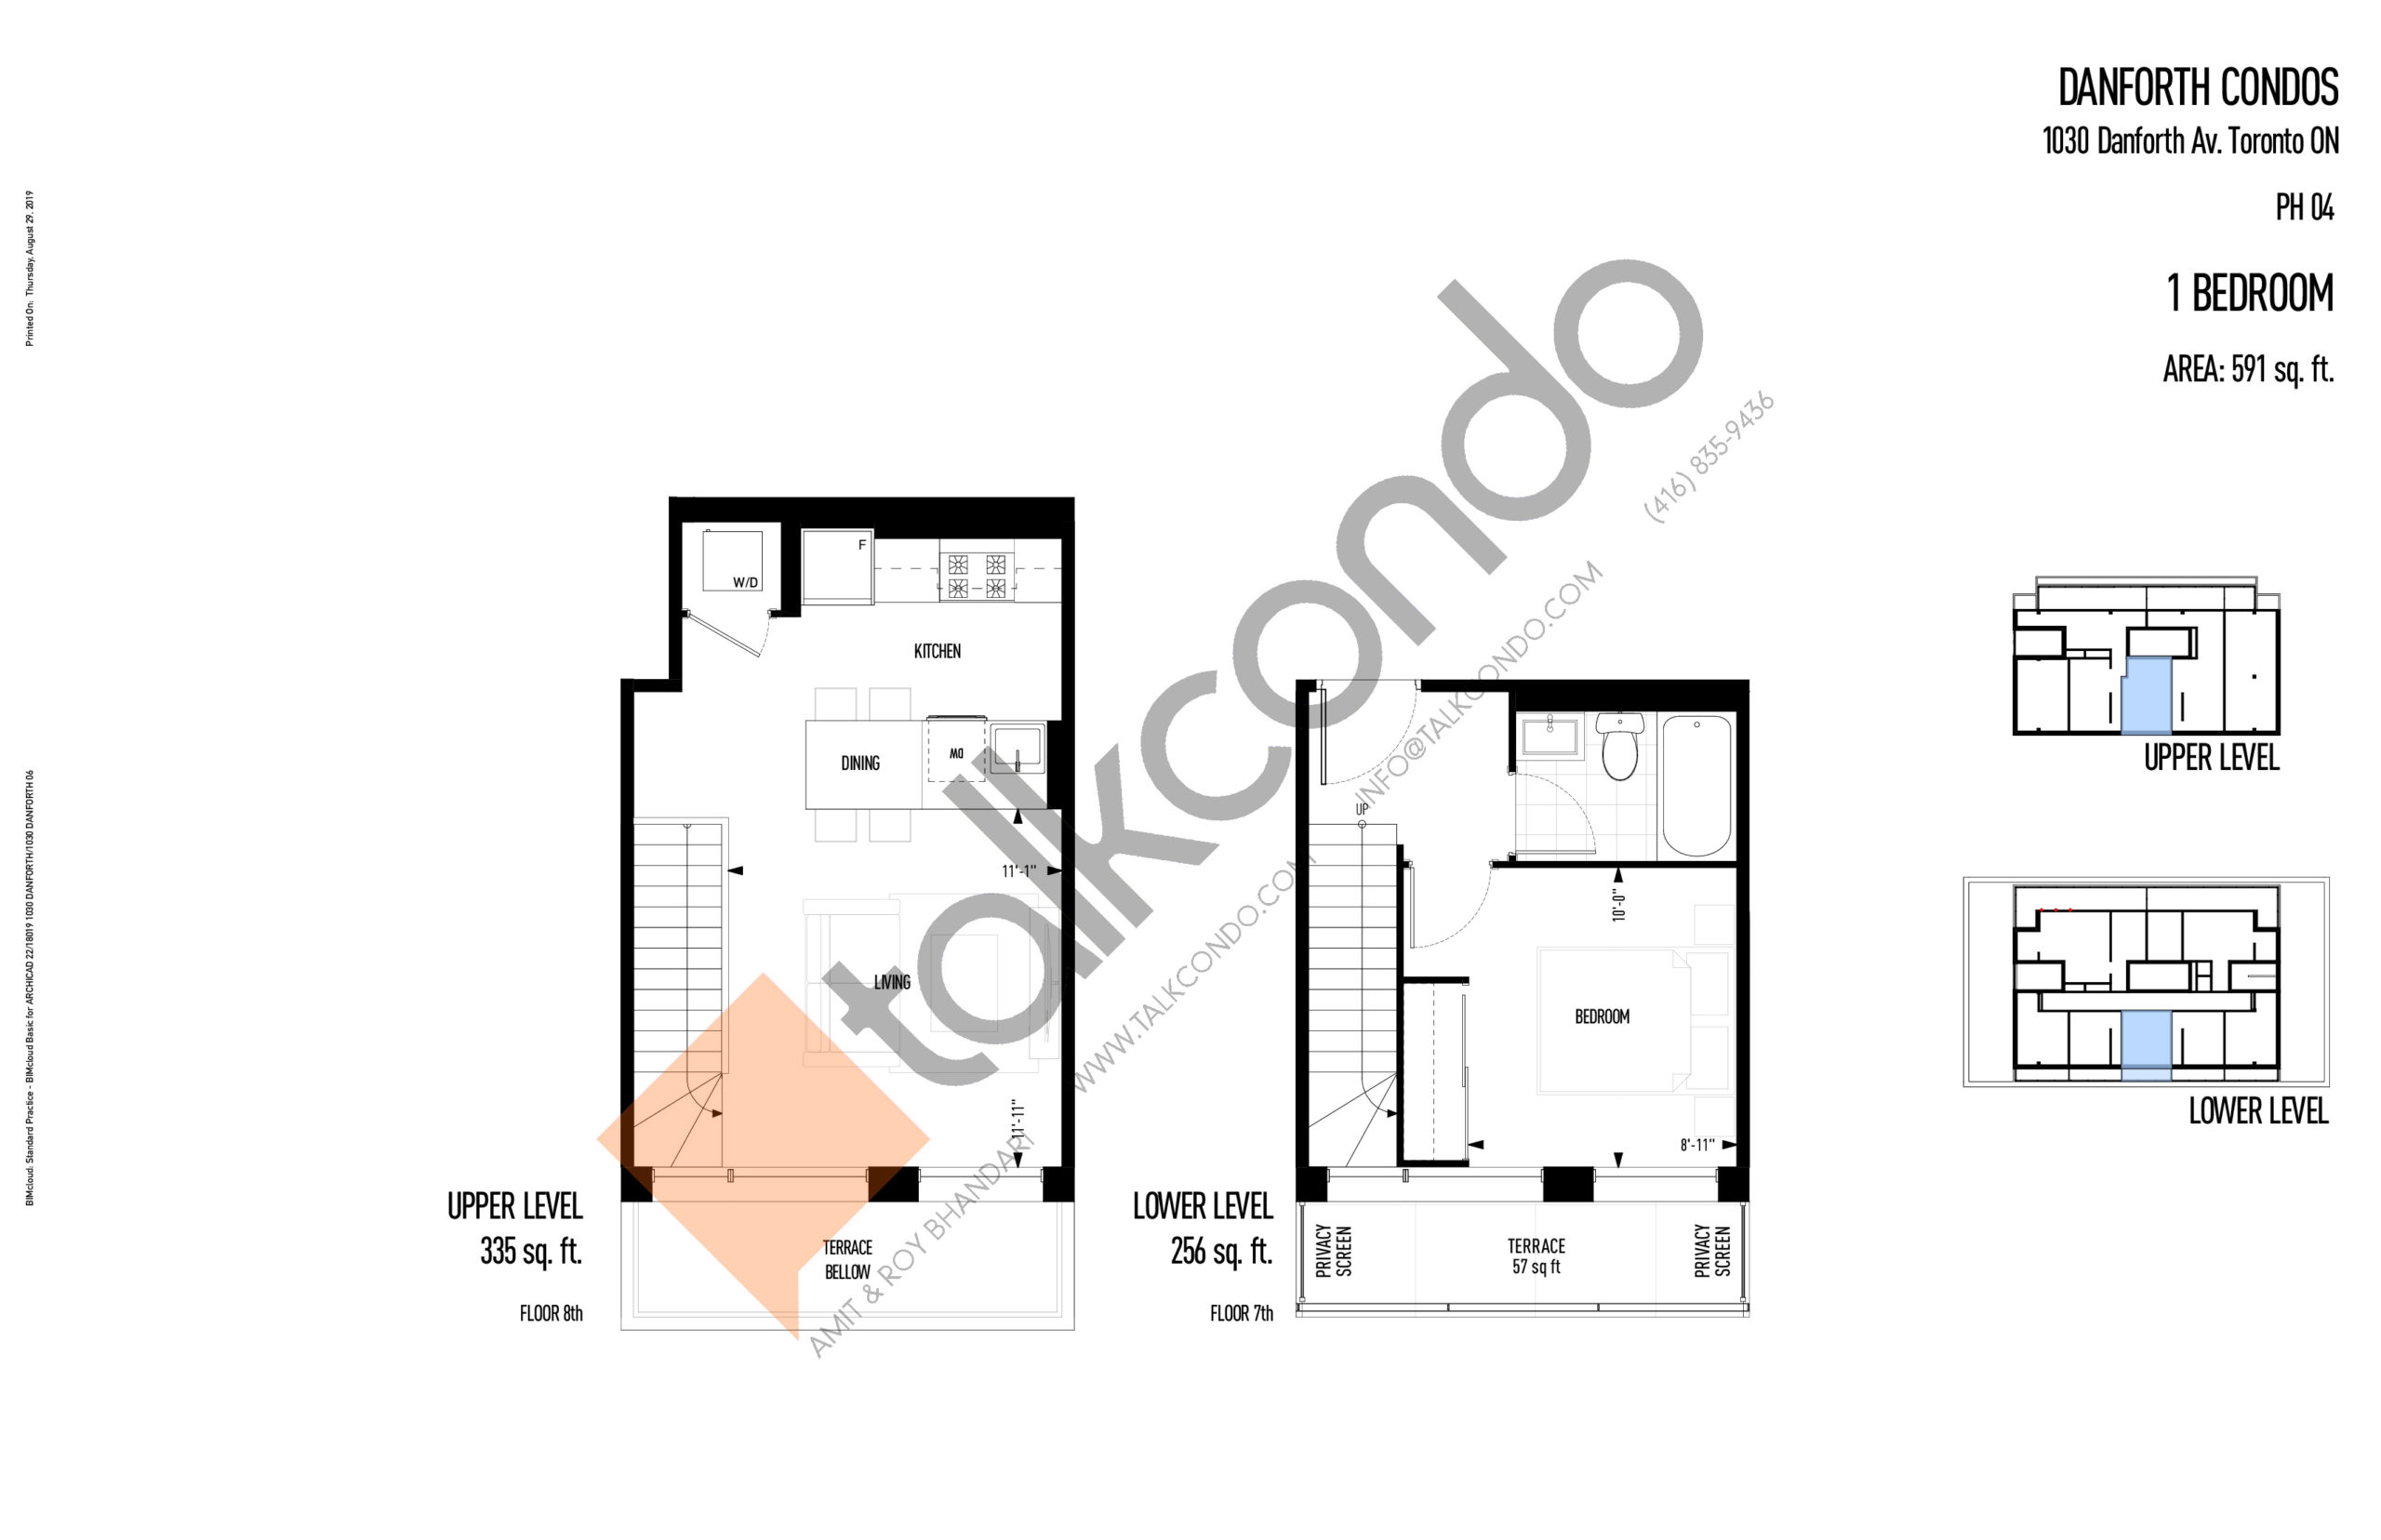 PH04 Floor Plan at THEO Condos - 591 sq.ft